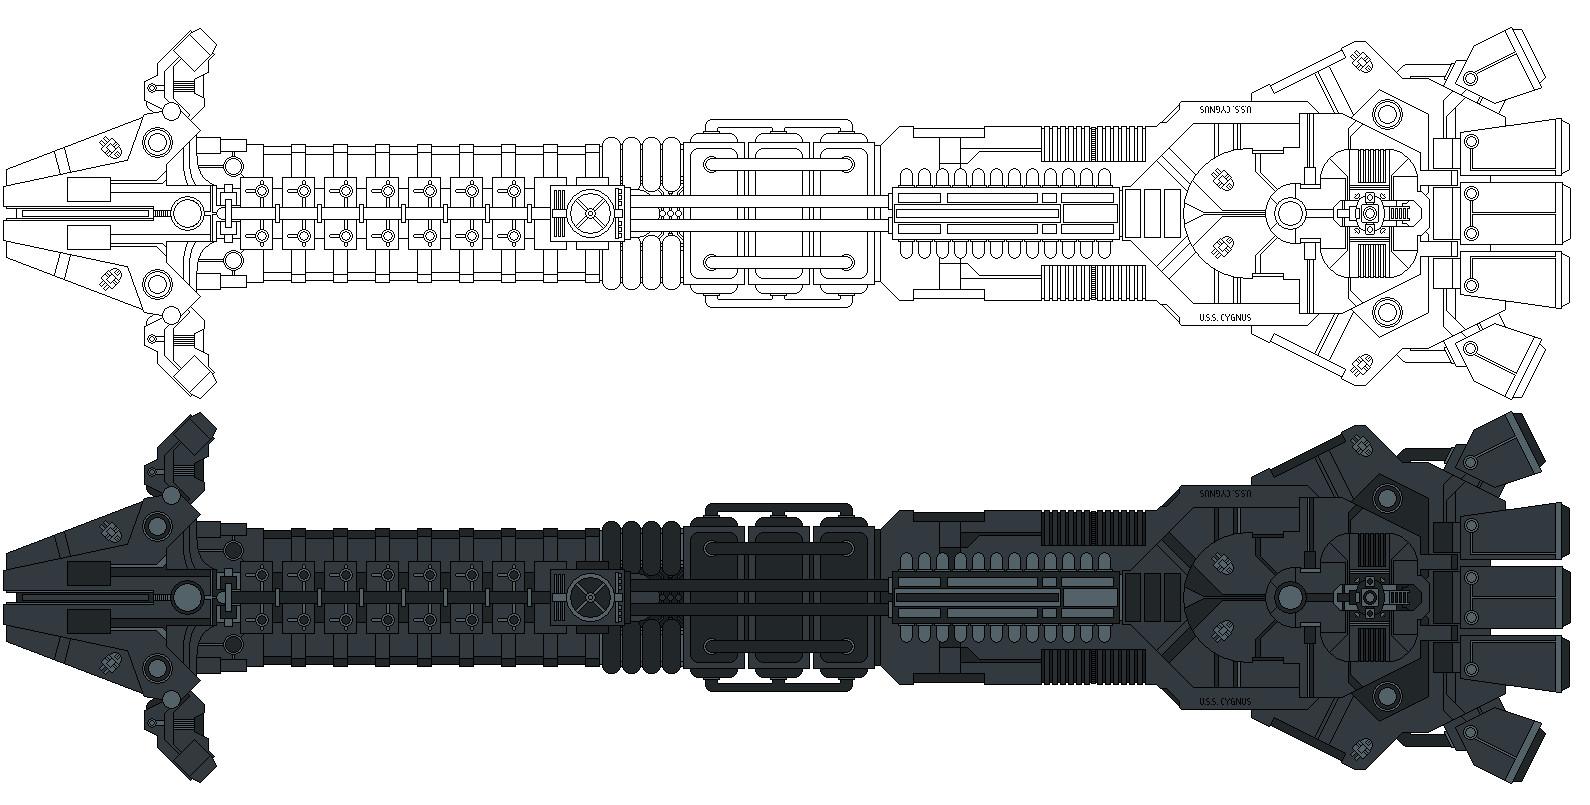 USS Cygnus Re-imagined by Balsavor on DeviantArt